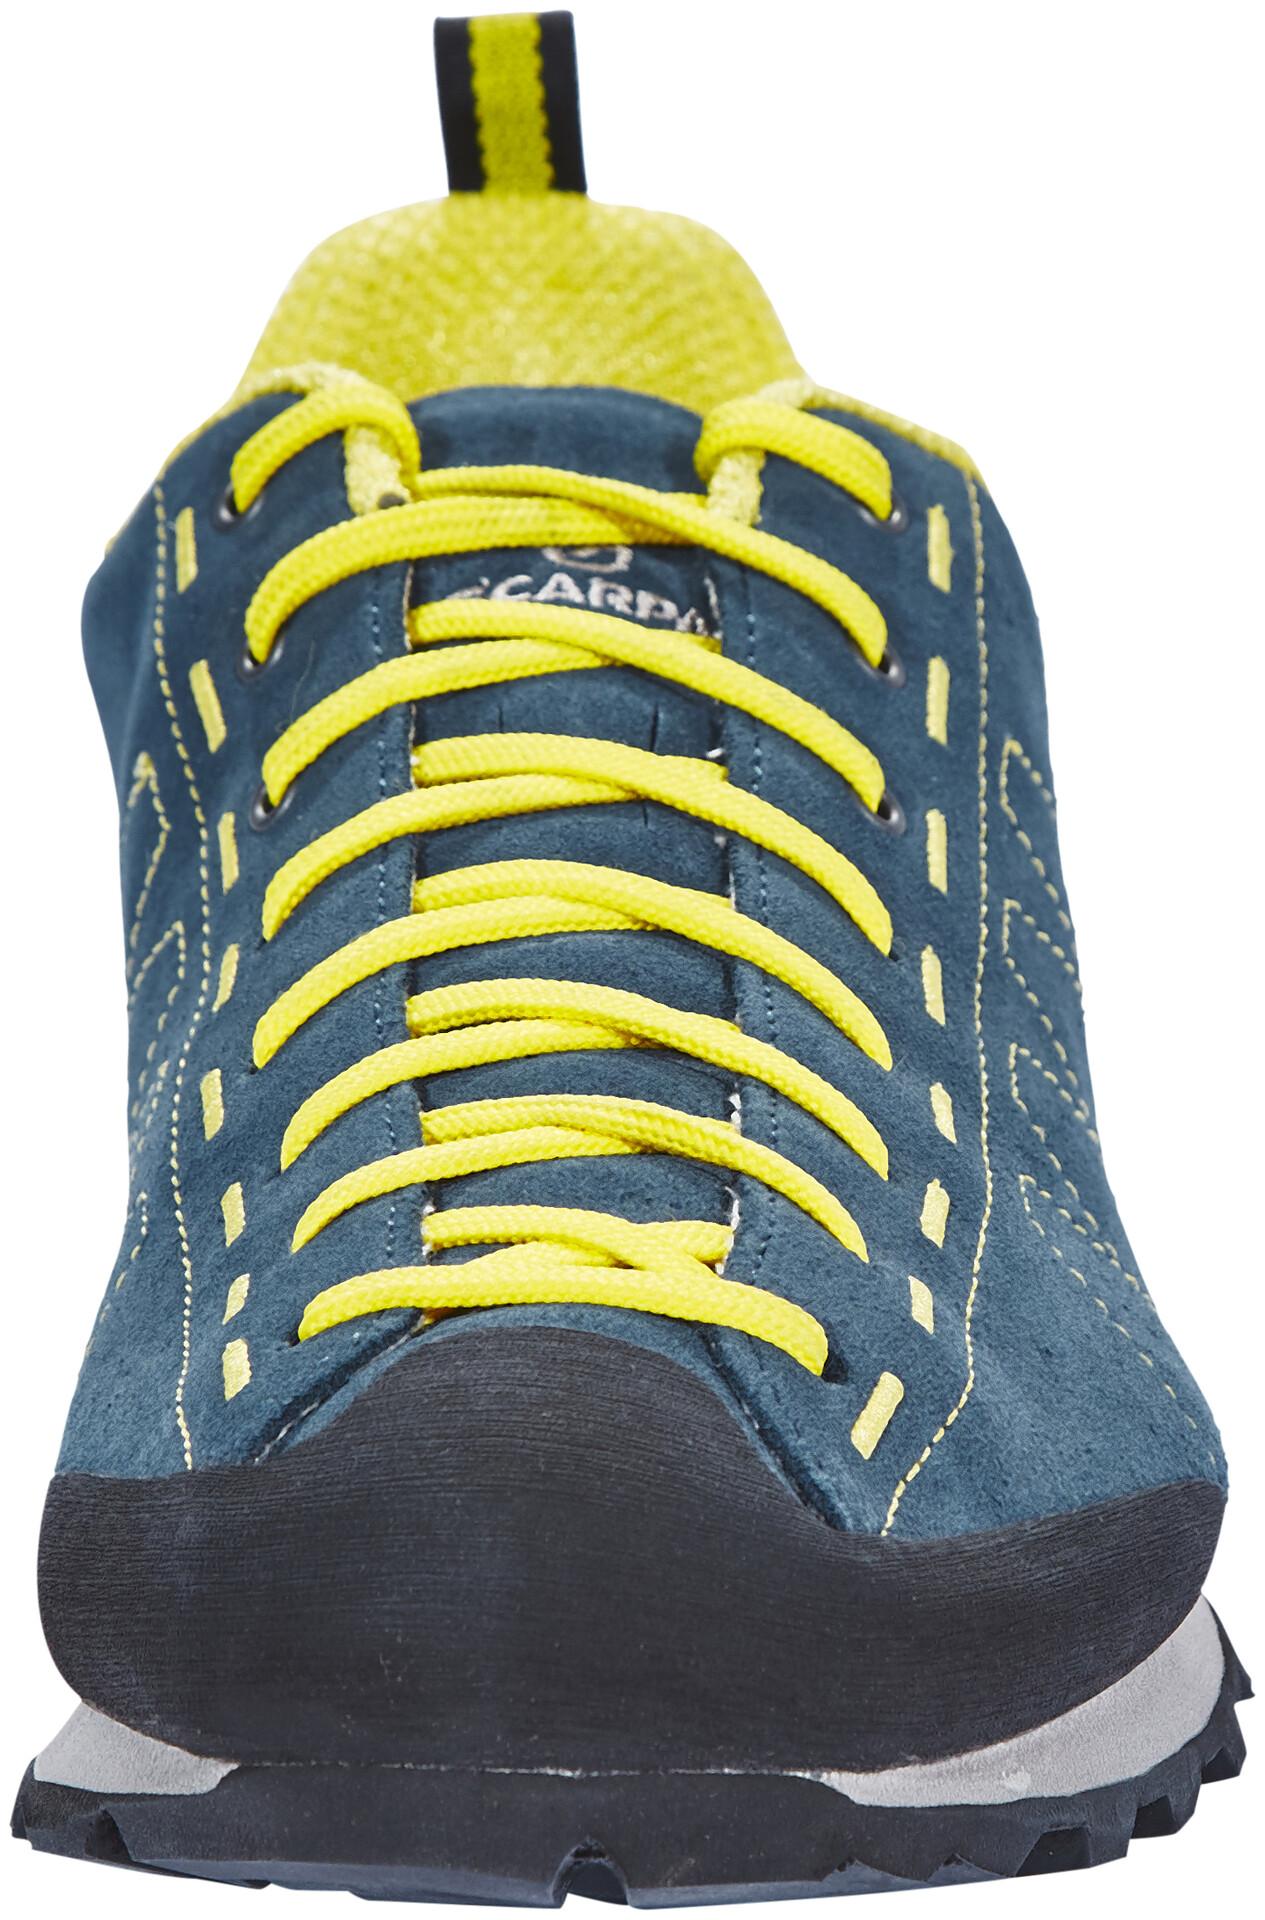 Uomooceanbright Highball Yellow Lu3kjct15f Scarpa Su Scarpe Addnature drCxeWBQoE